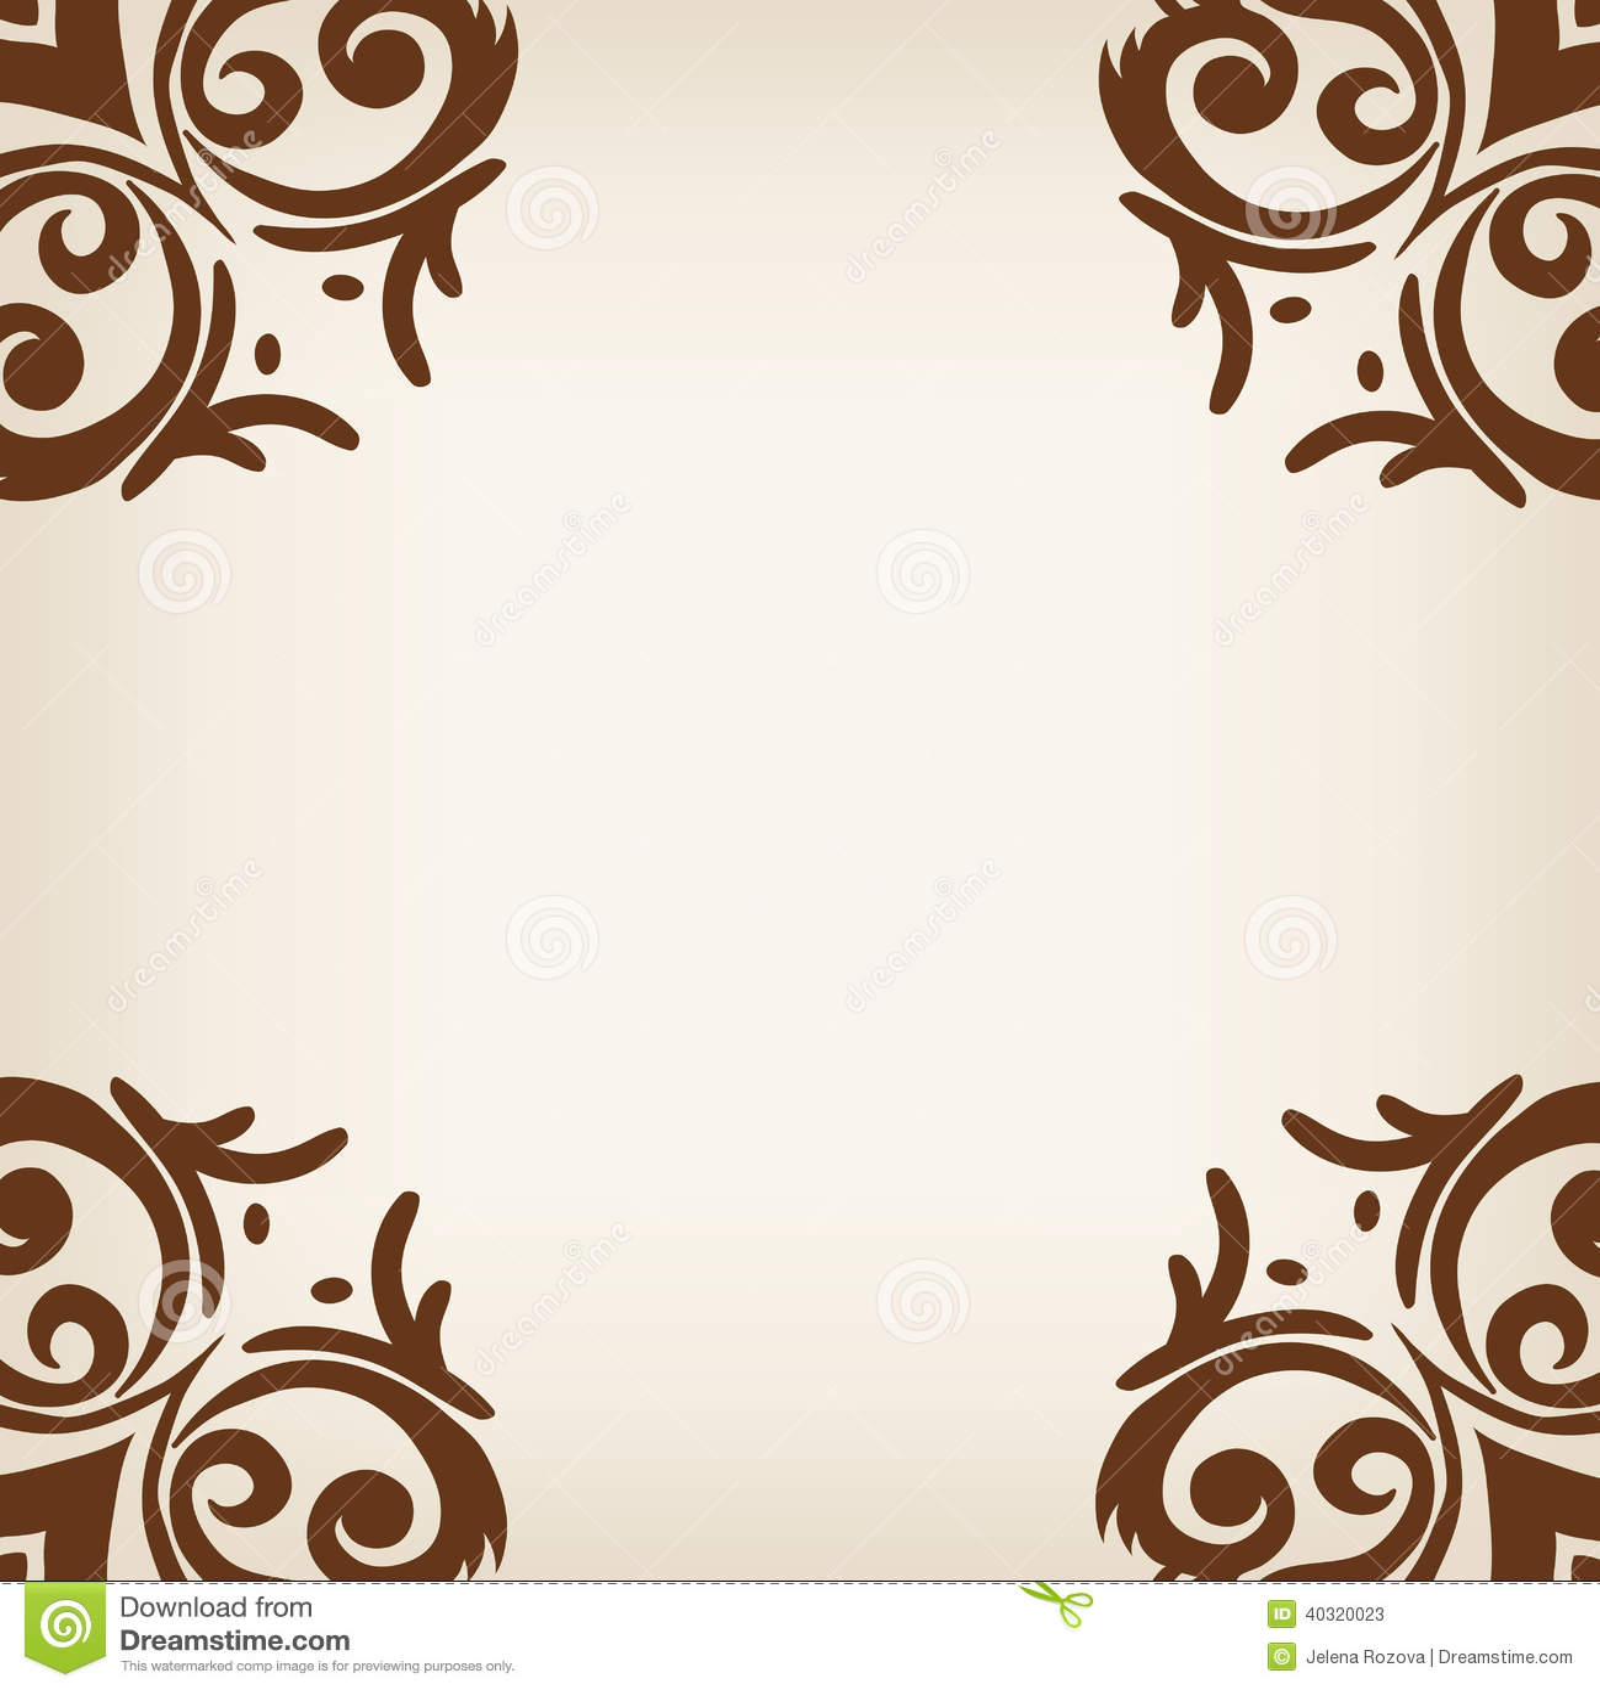 brown frameborder